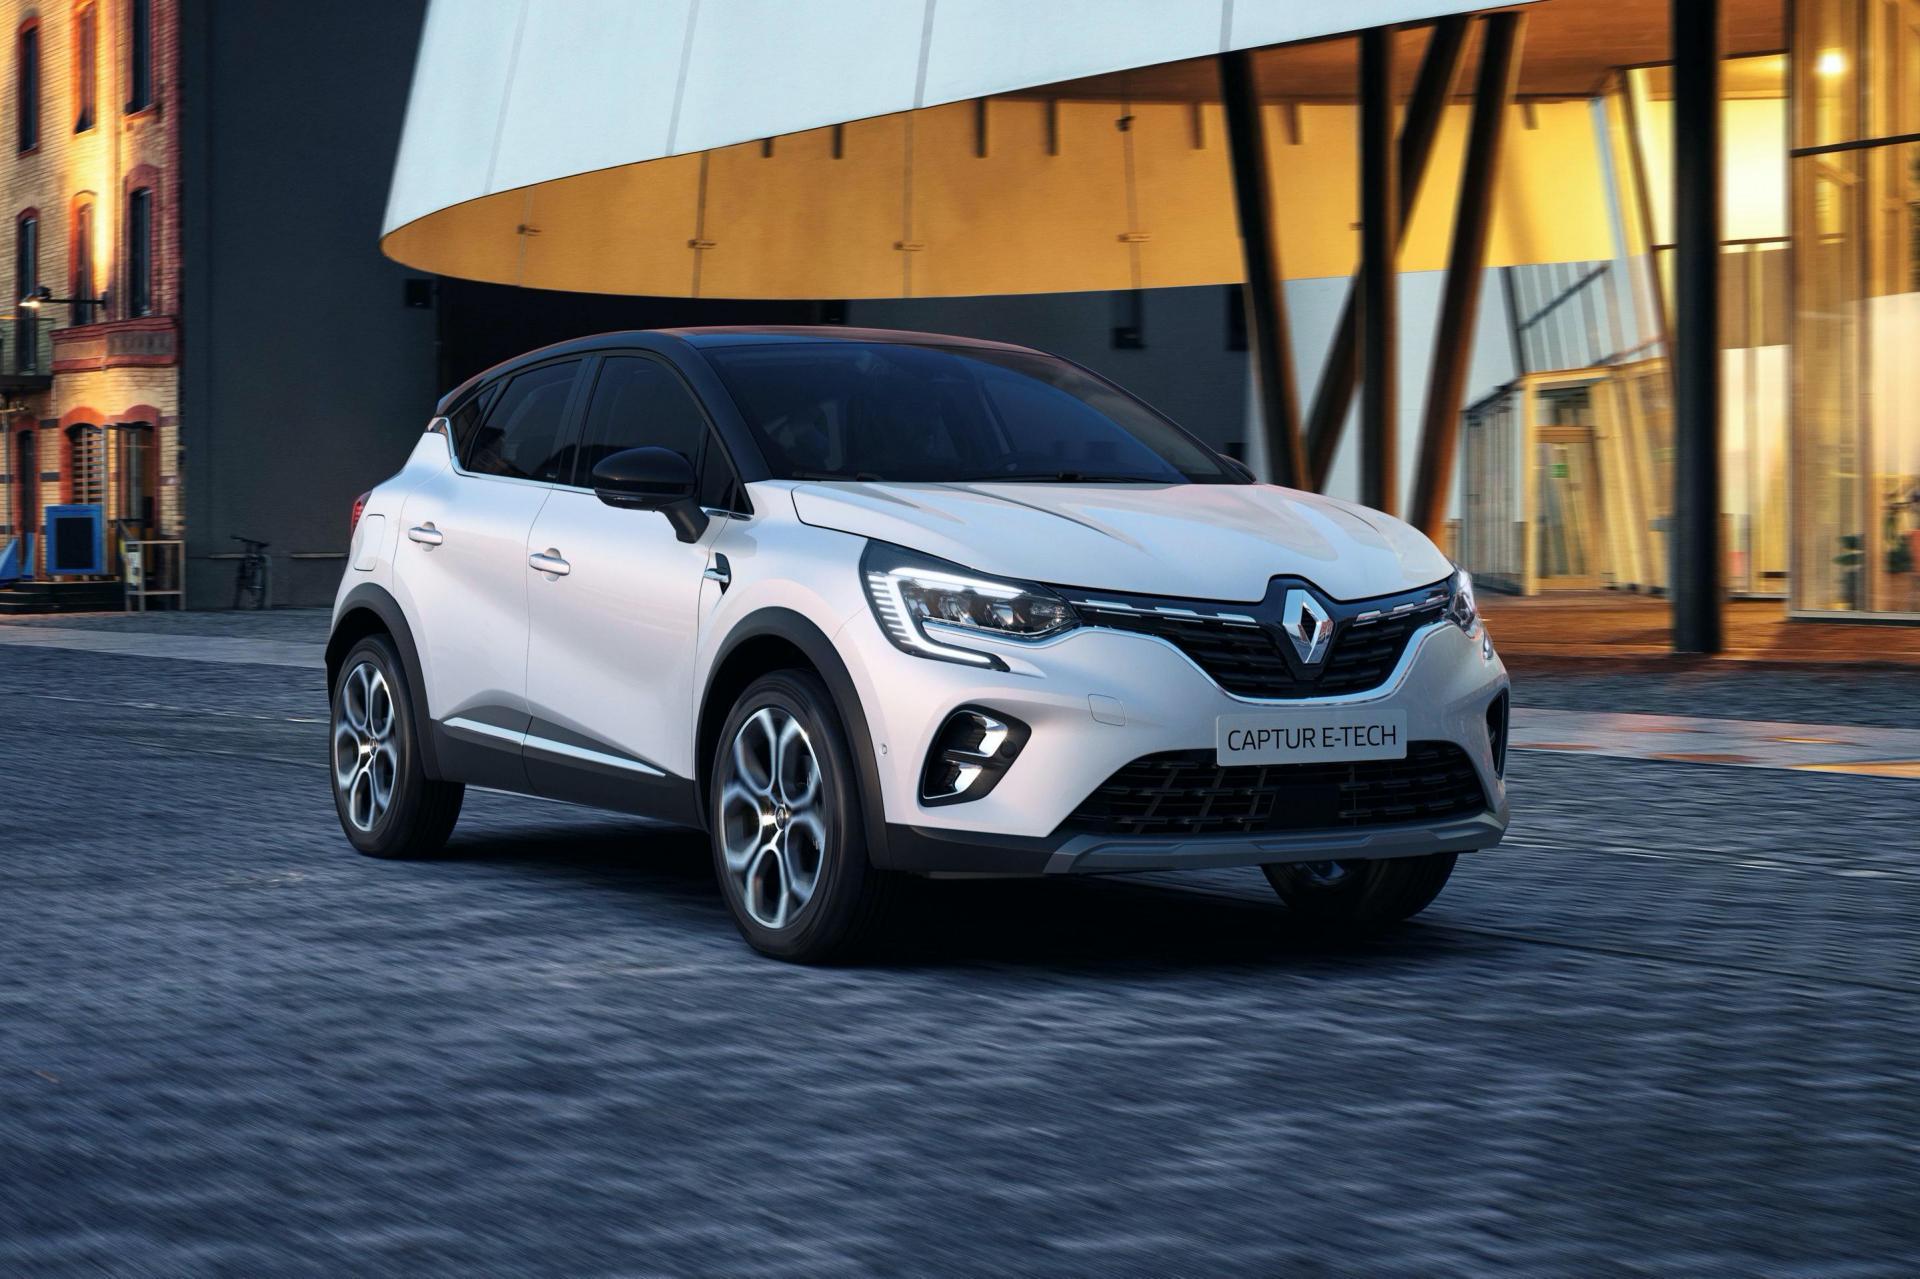 2020-Renault-Captur-E-Tech-plug-in-hybrid-14